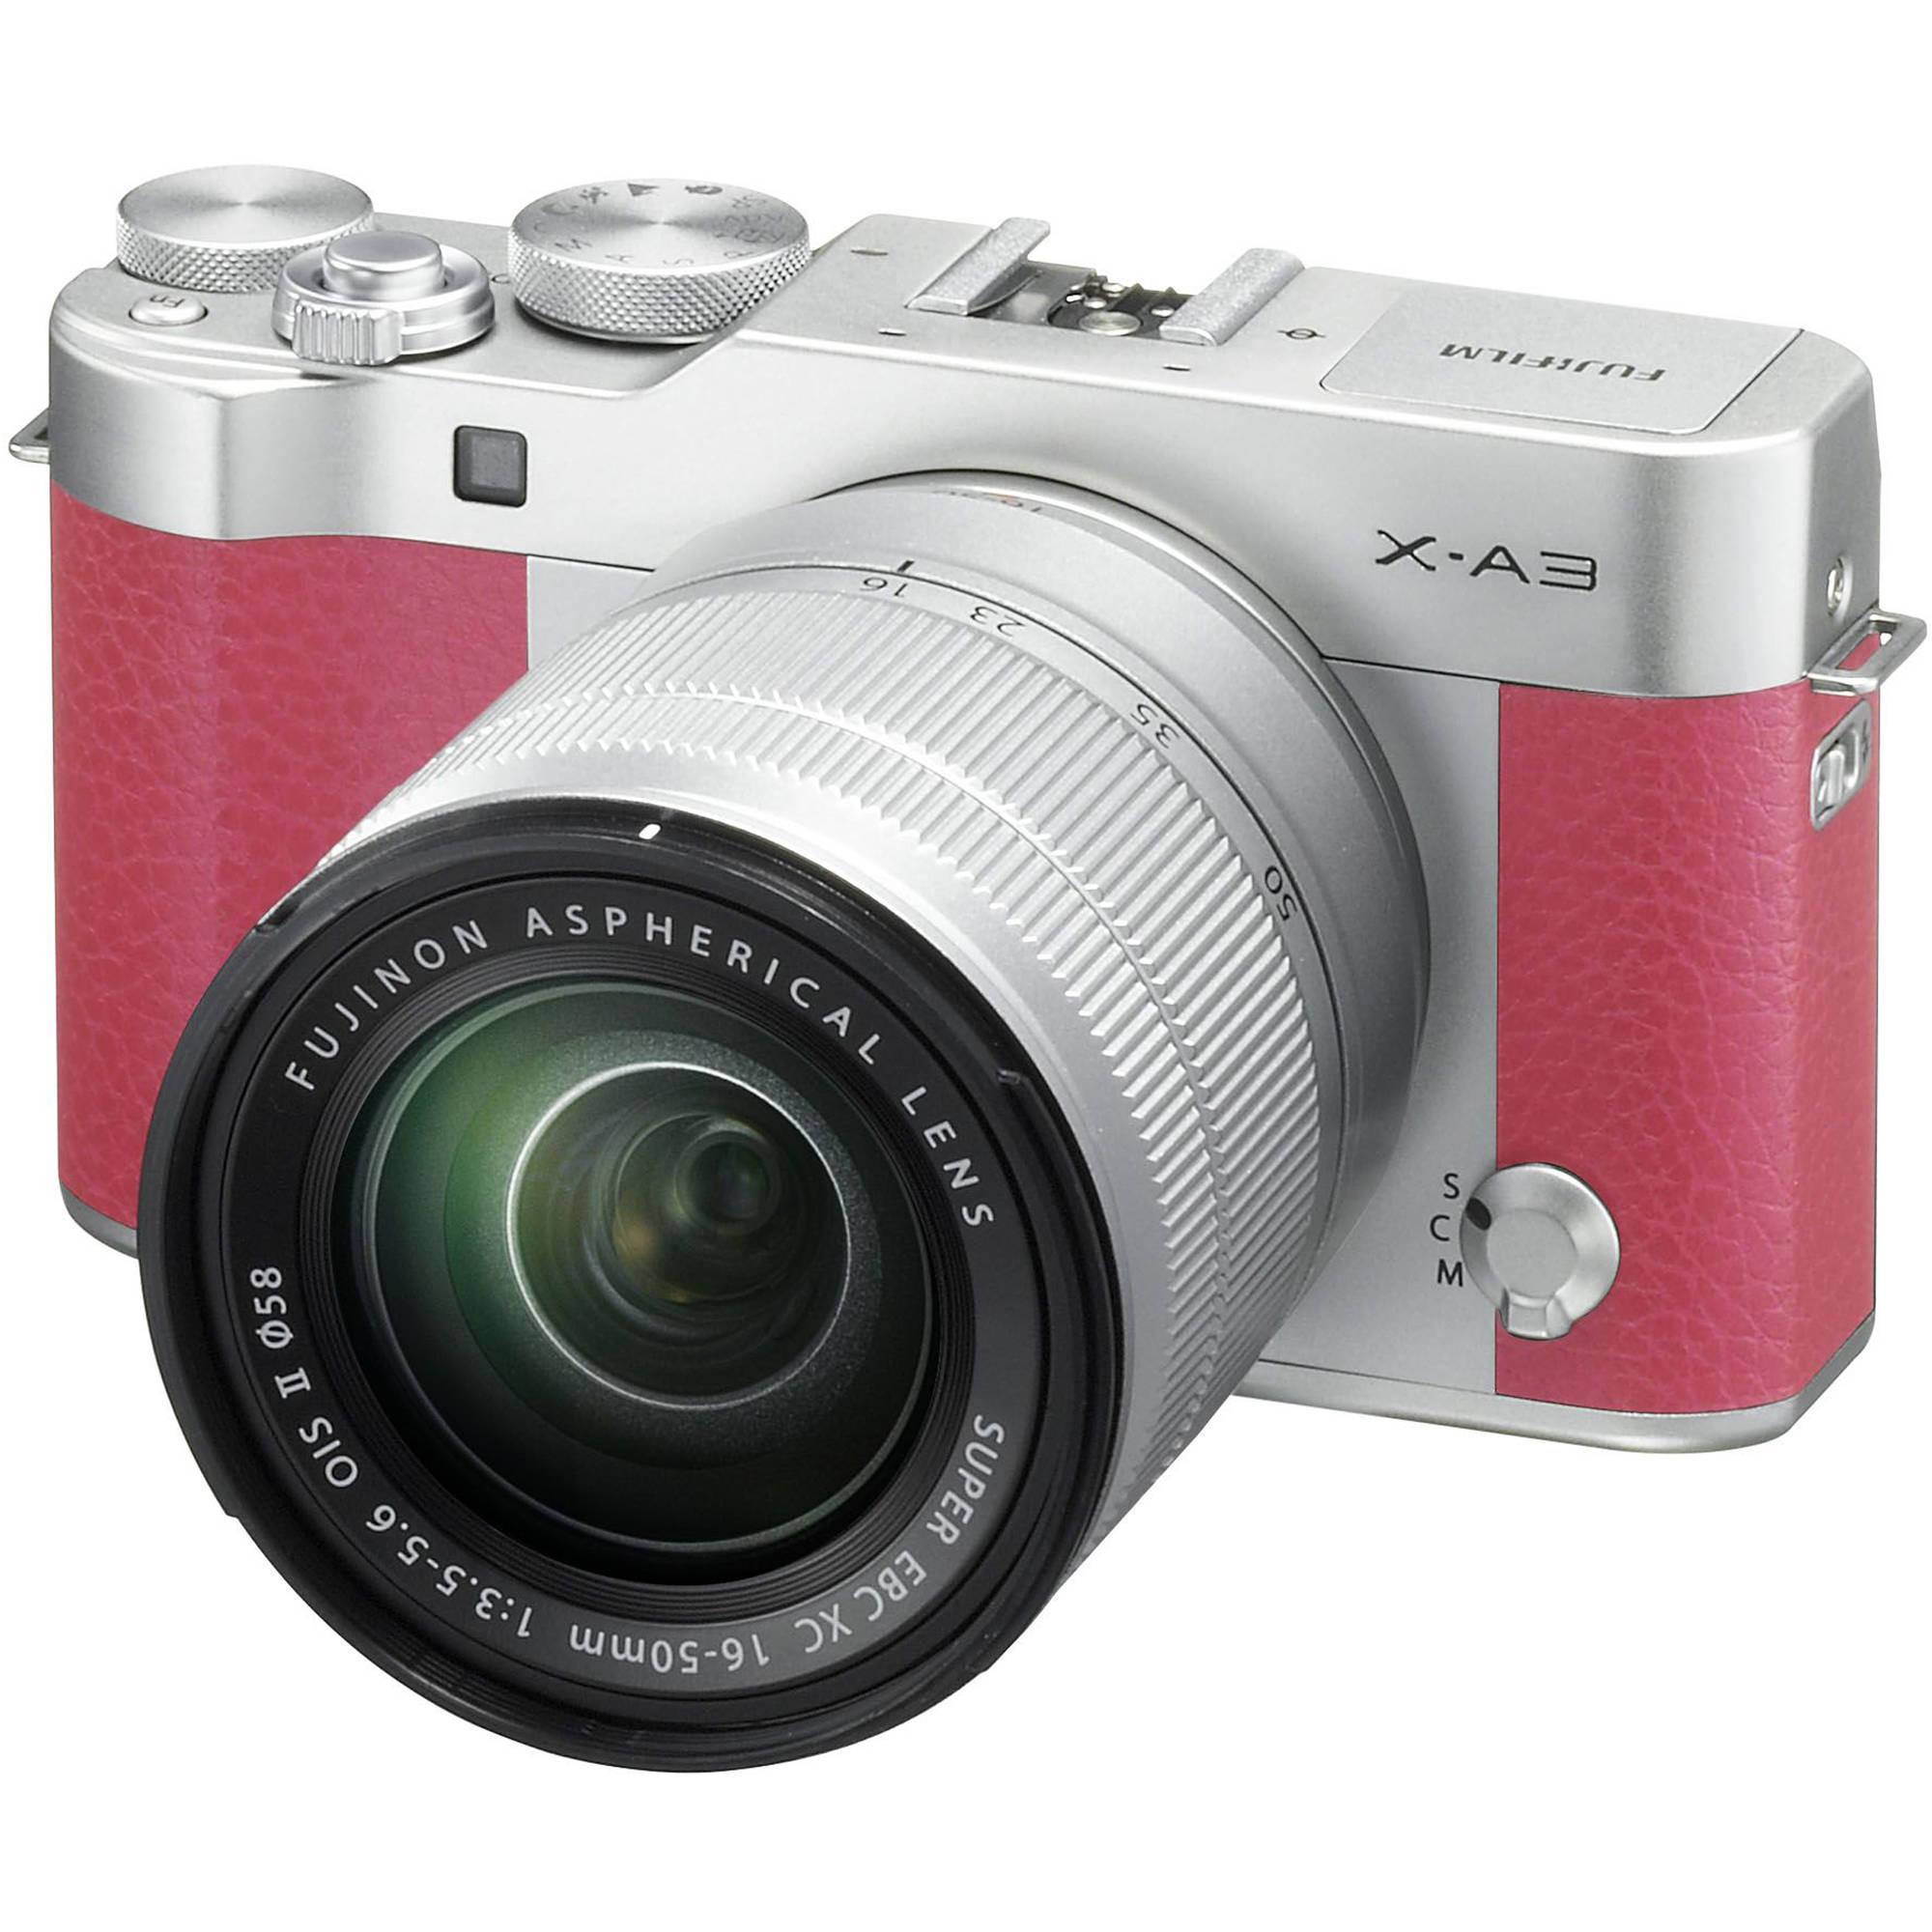 Fujifilm X-A3 Mirrorless Digital Camera with 16-50mm 16531659